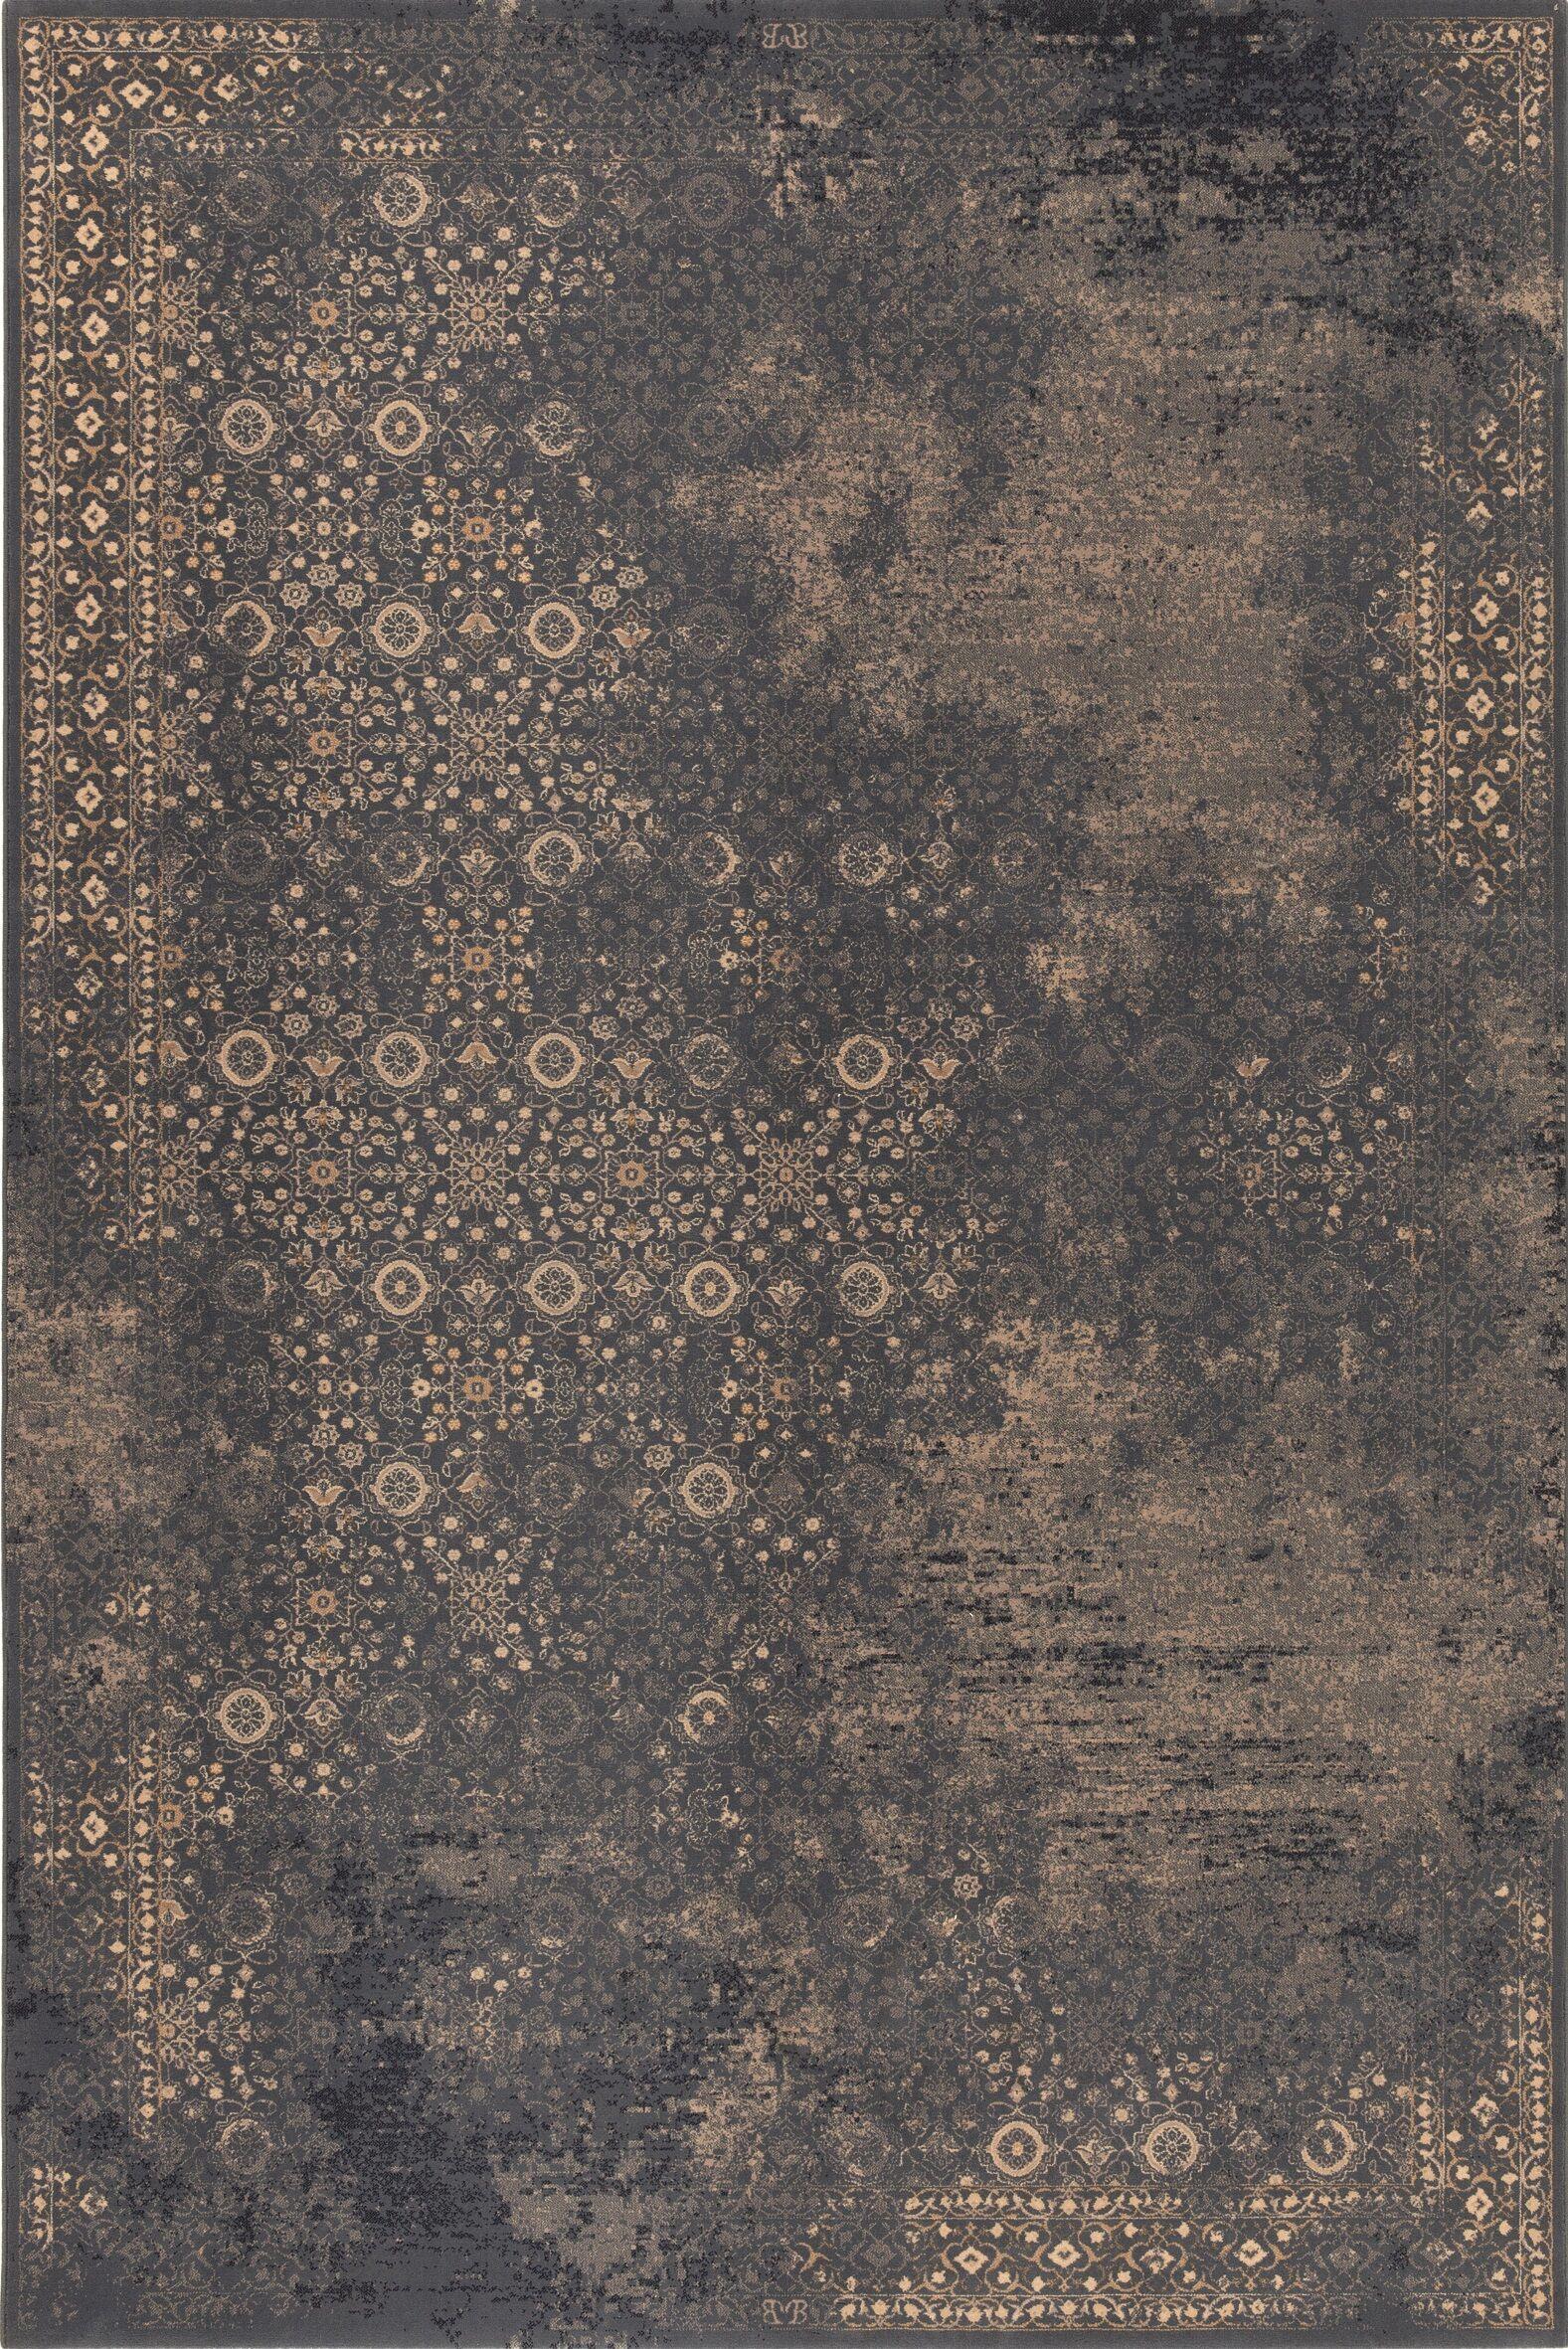 Covington Wool Brown Area Rug Rug Size: Rectangle 6'7